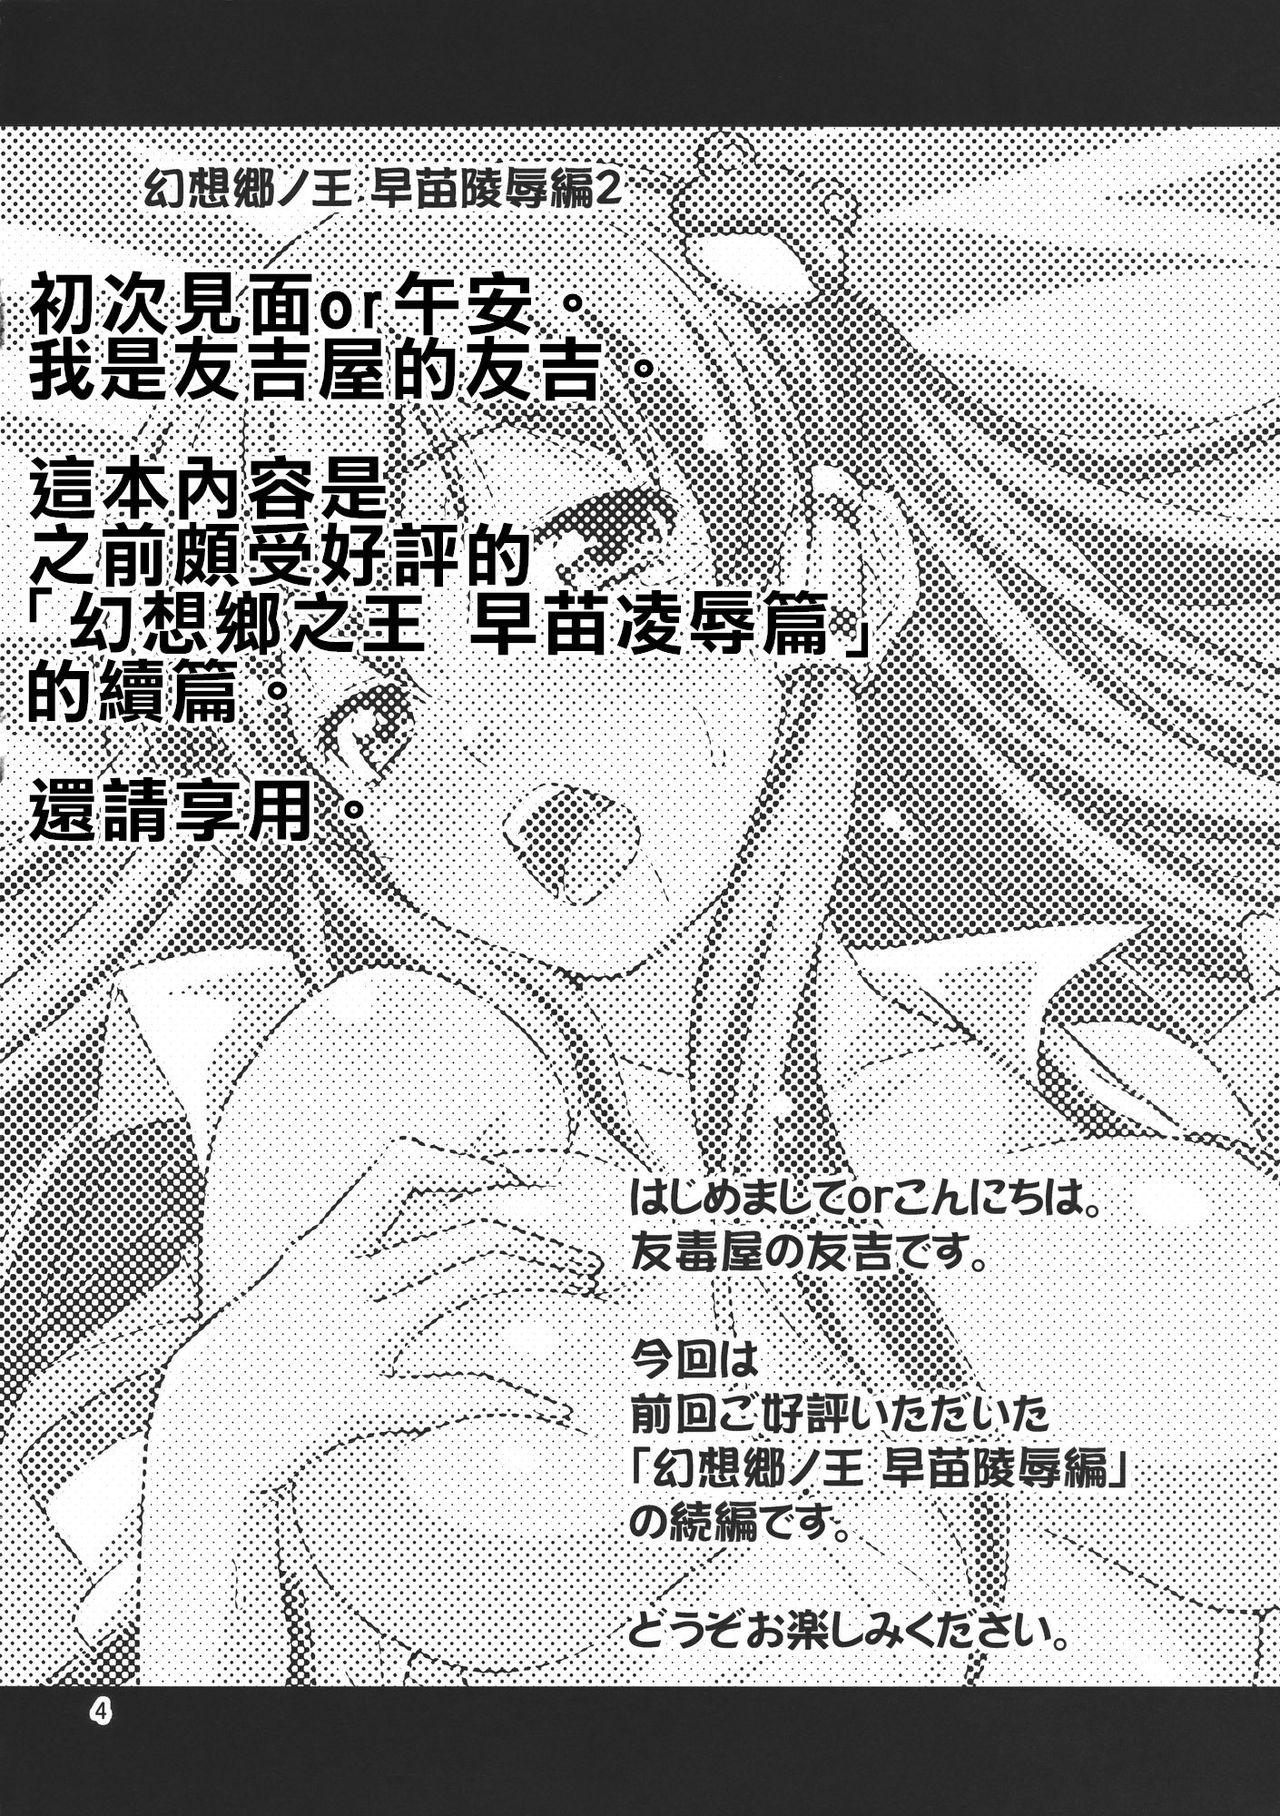 Gensoukyou no Ou Sanae Ryoujoku Hen 2 2